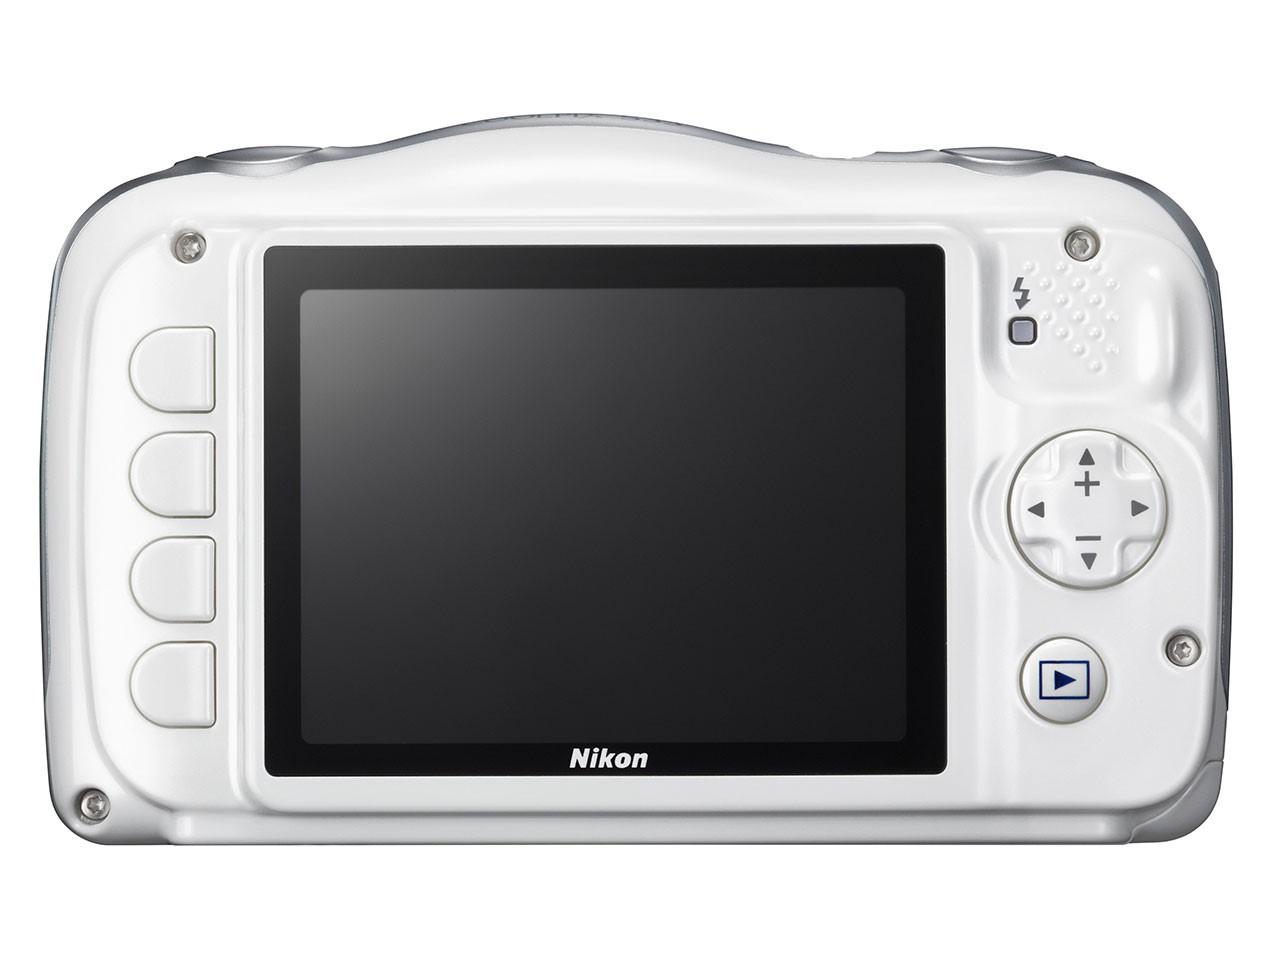 Nikon Coolpix S33-as kijelzője 2,7 colos LCD, 230 ezer képponttal.